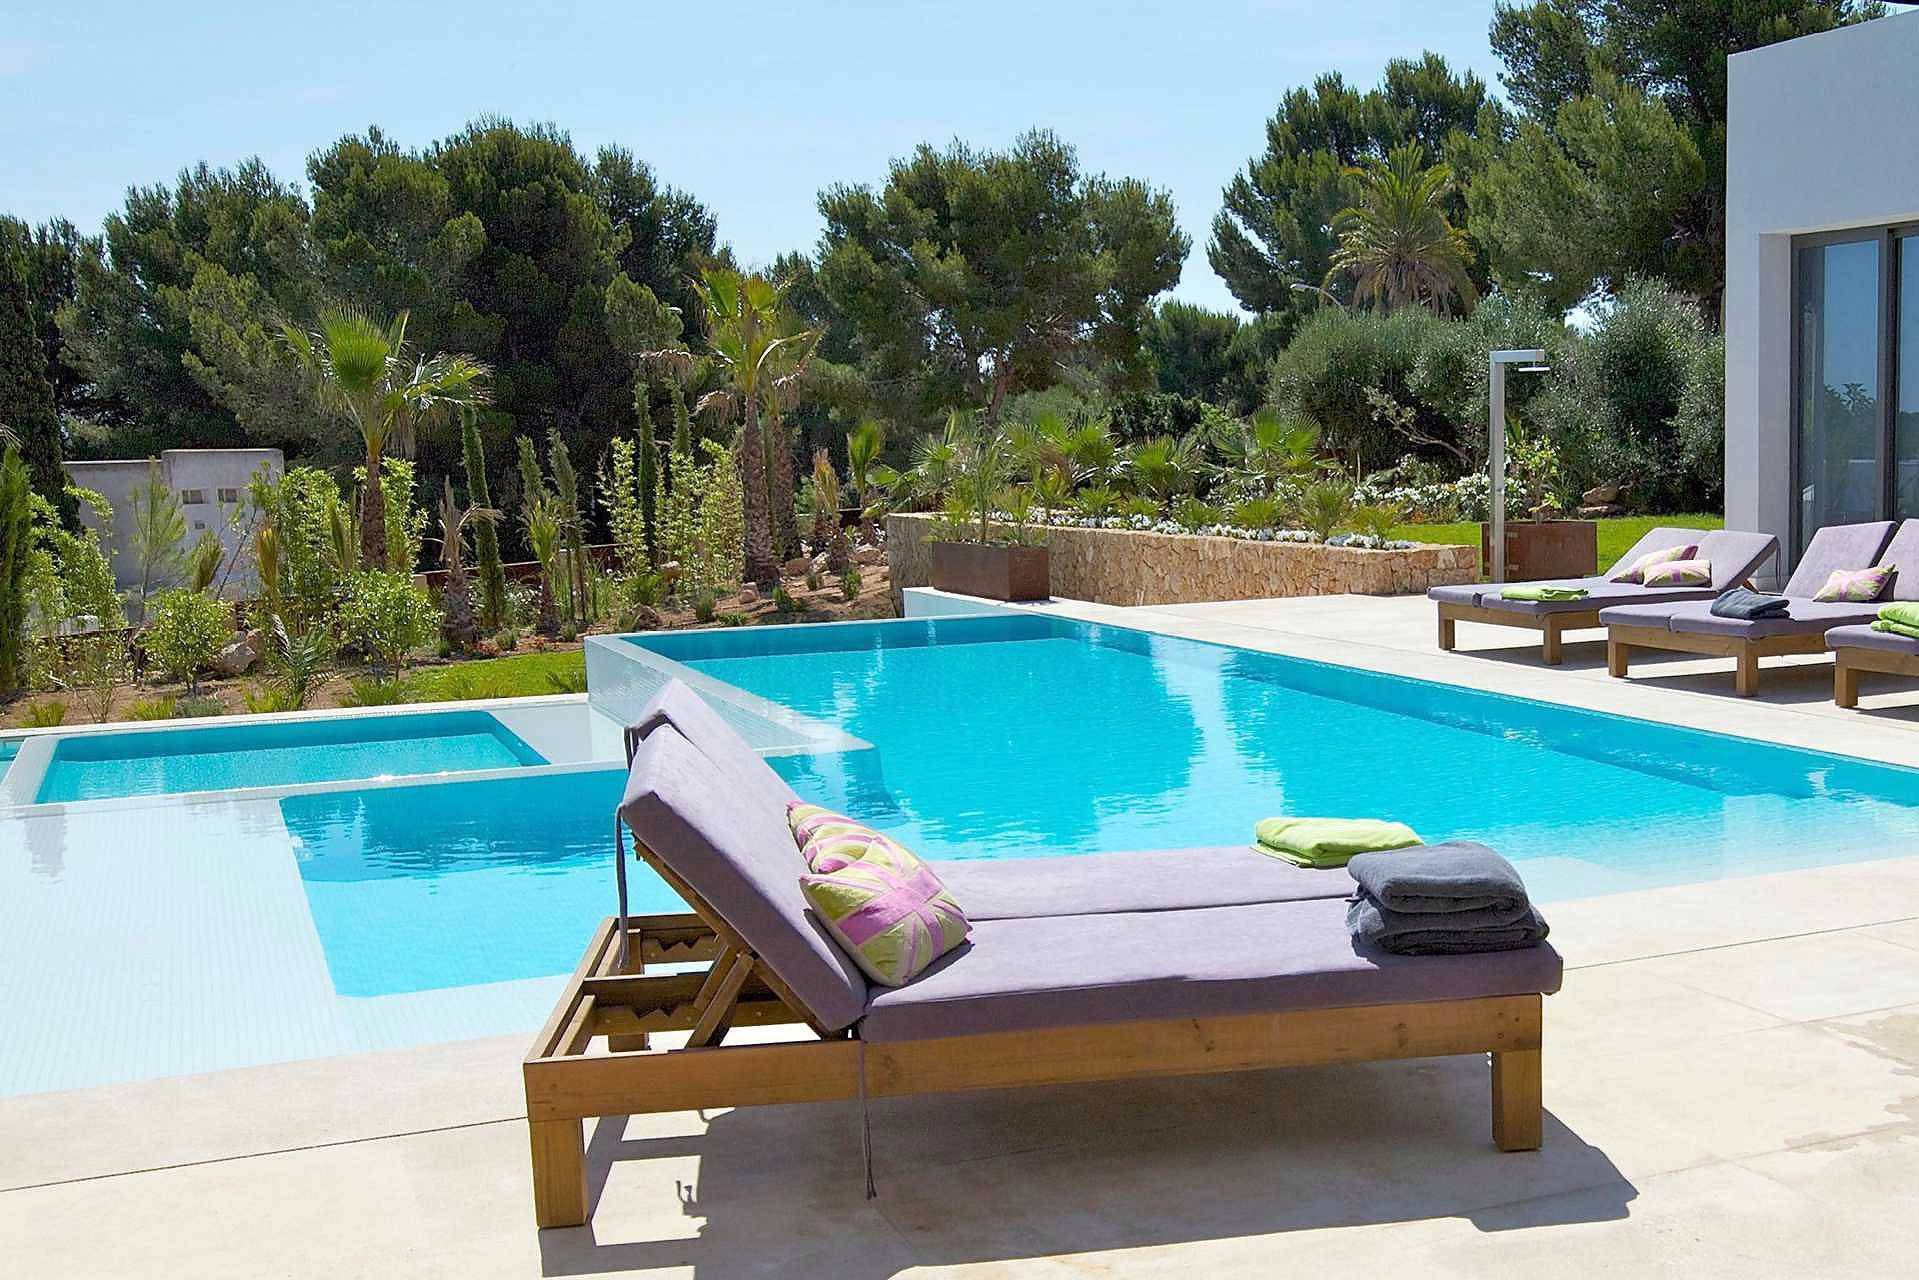 01-92 Design Villa Mallorca Südwesten Bild 3